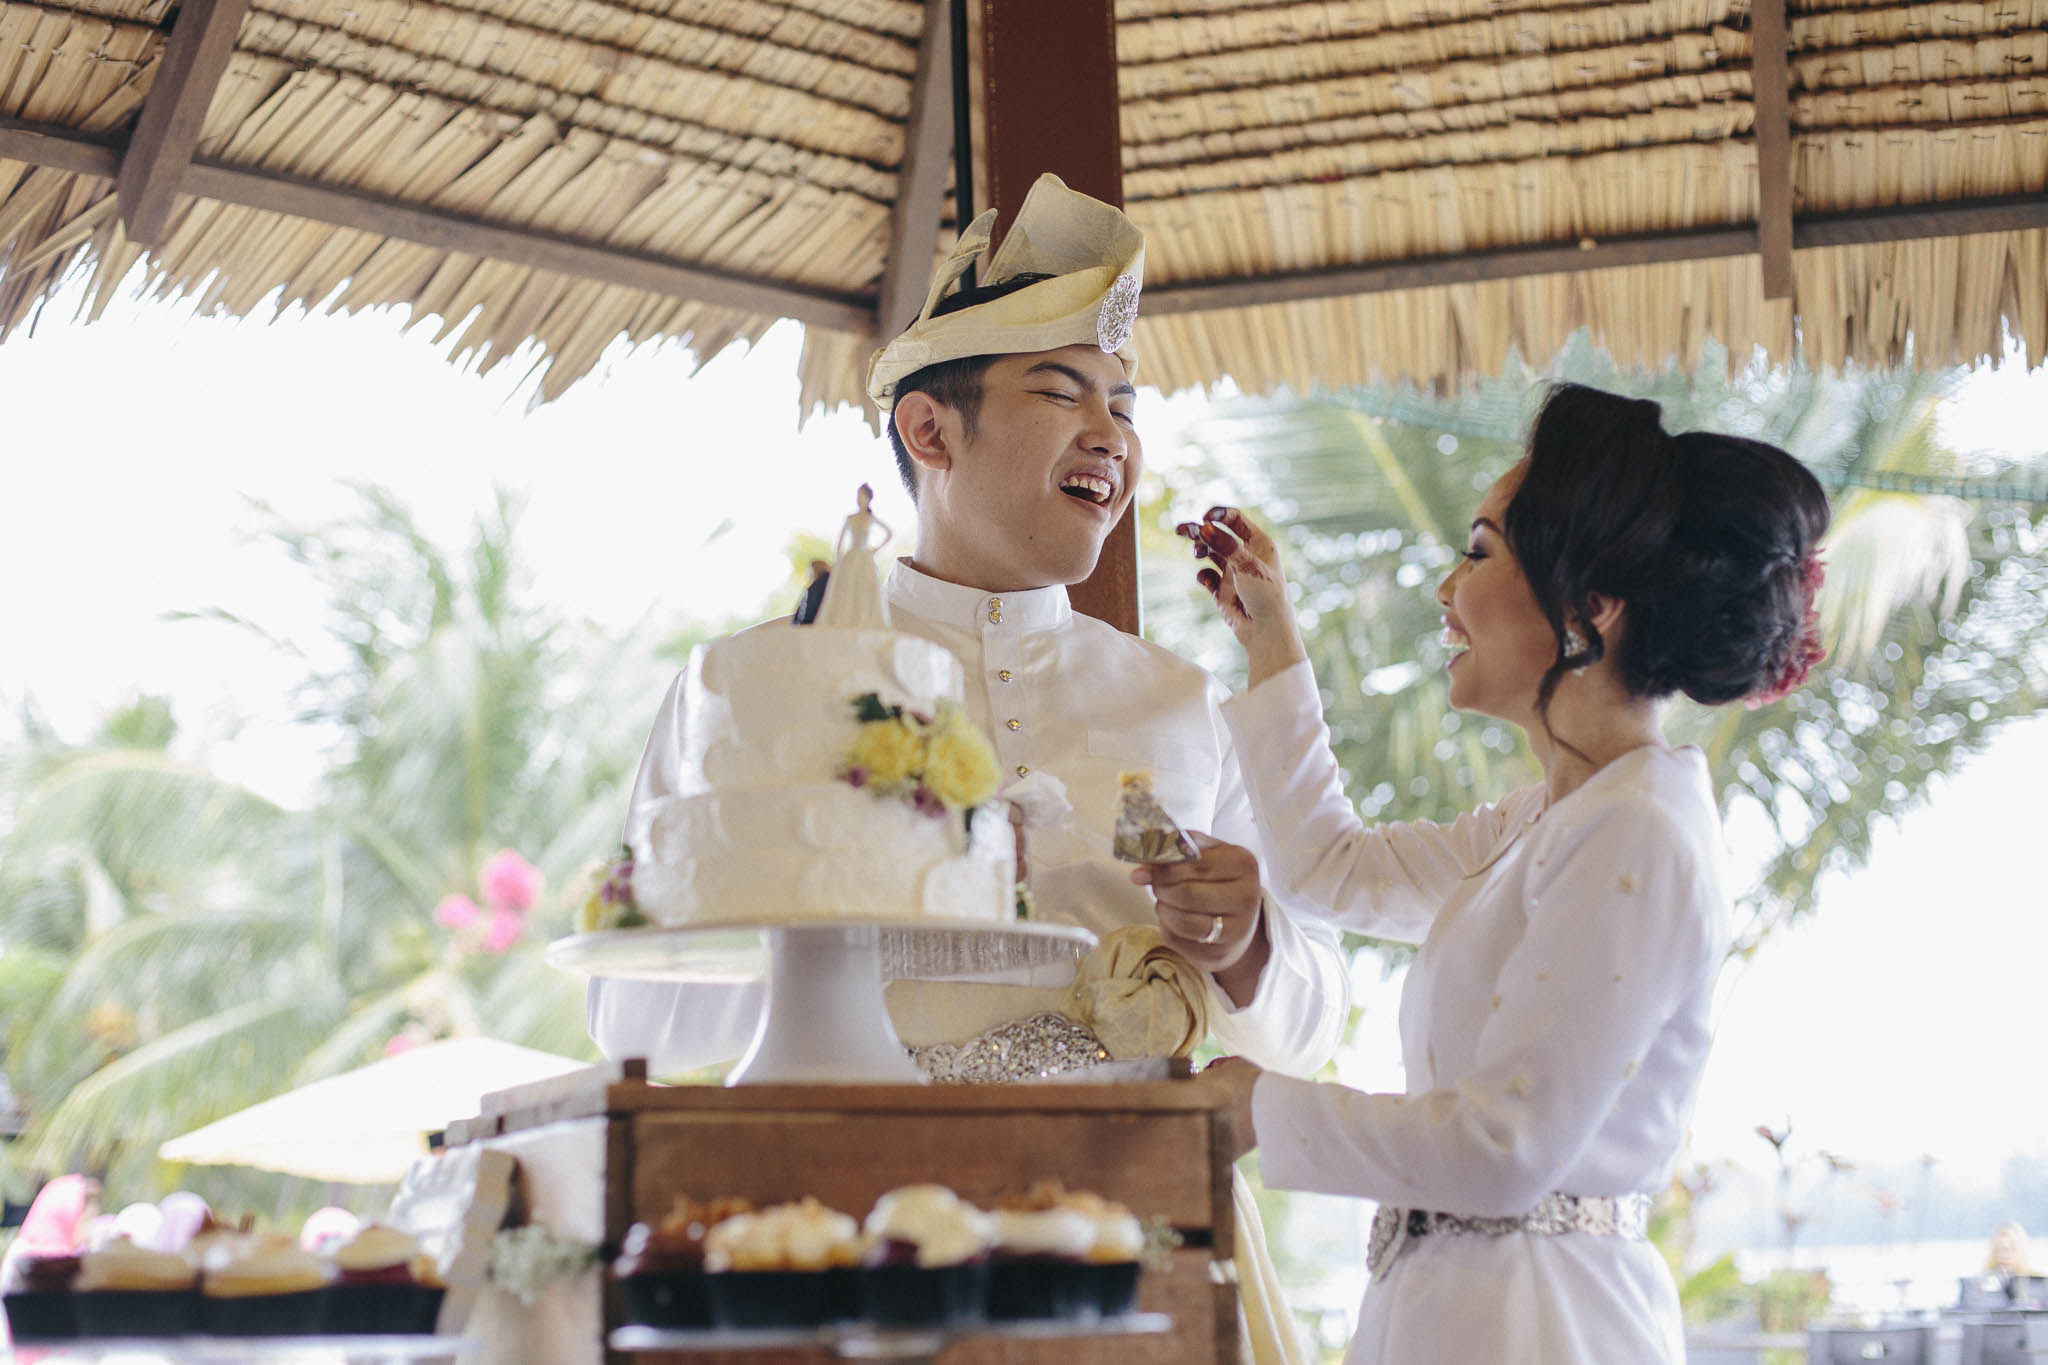 singapore-wedding-photographer-travel-khairul-atikah-62.jpg